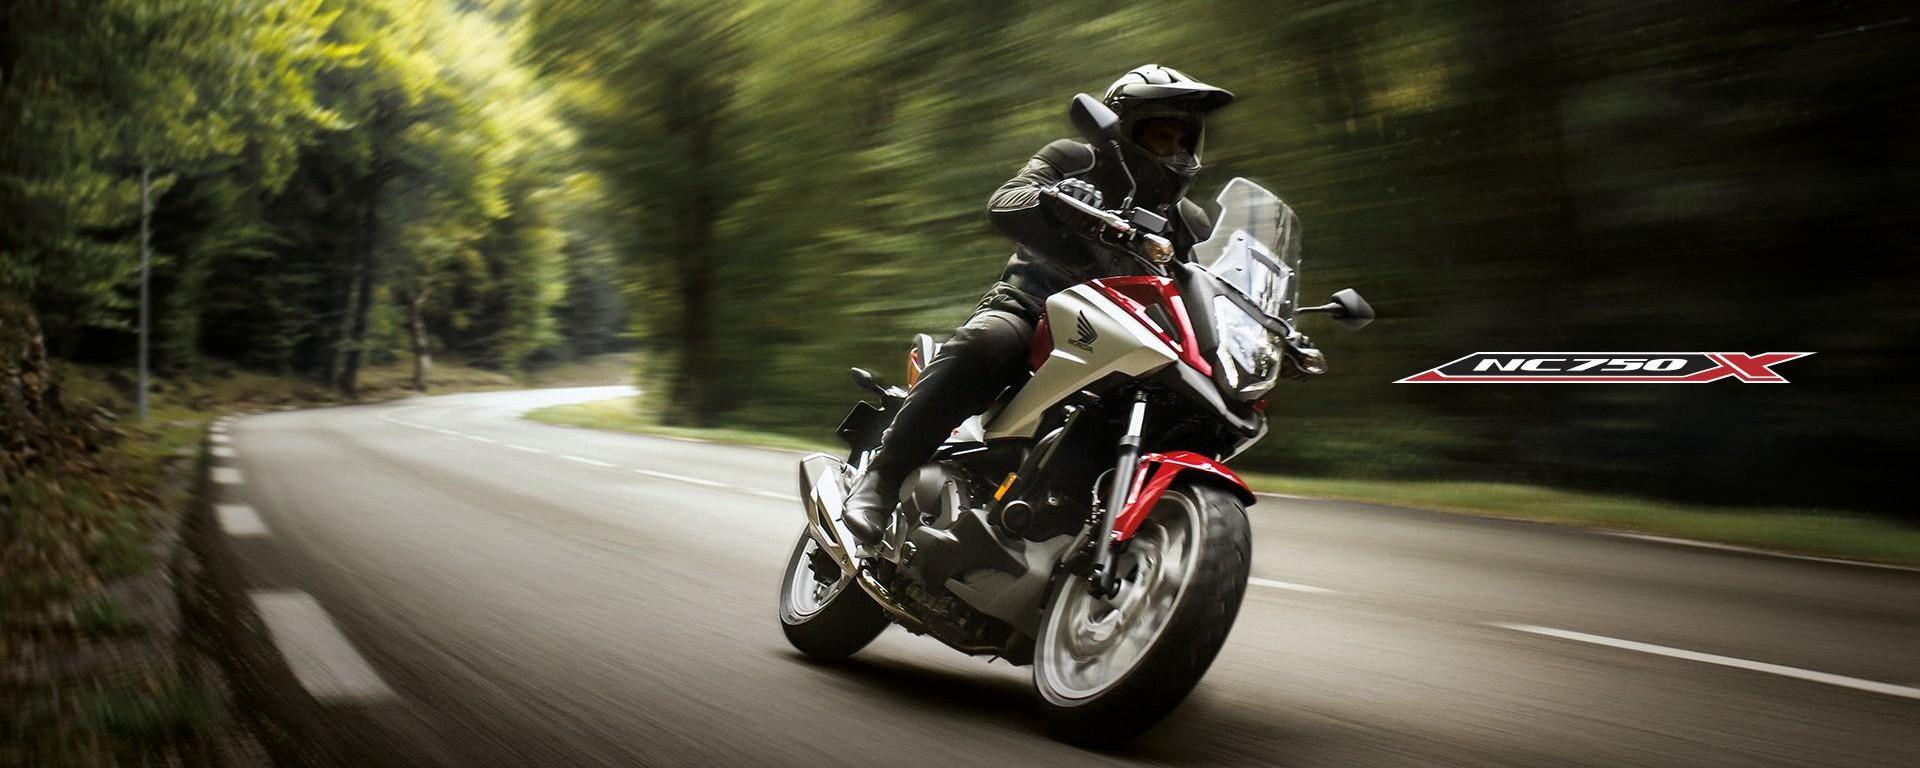 Honda-bigbike-Motorcycle-มอเตอร์ไซค์-บิ๊กไบค์-ฮอนด้า-NC750X-MT